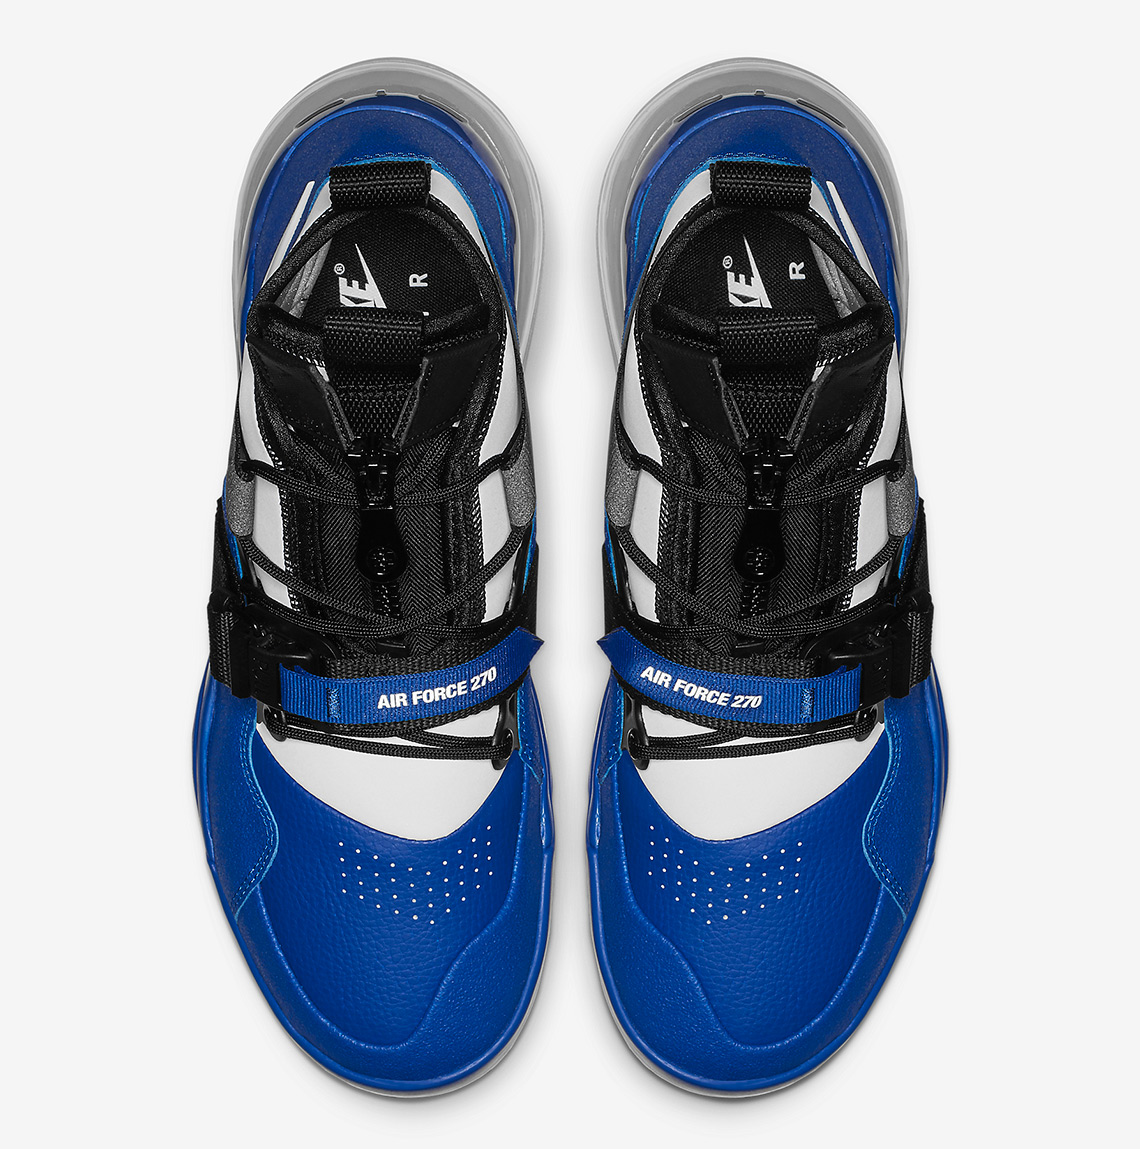 Nike Air Force 270 Utility AQ0572-400